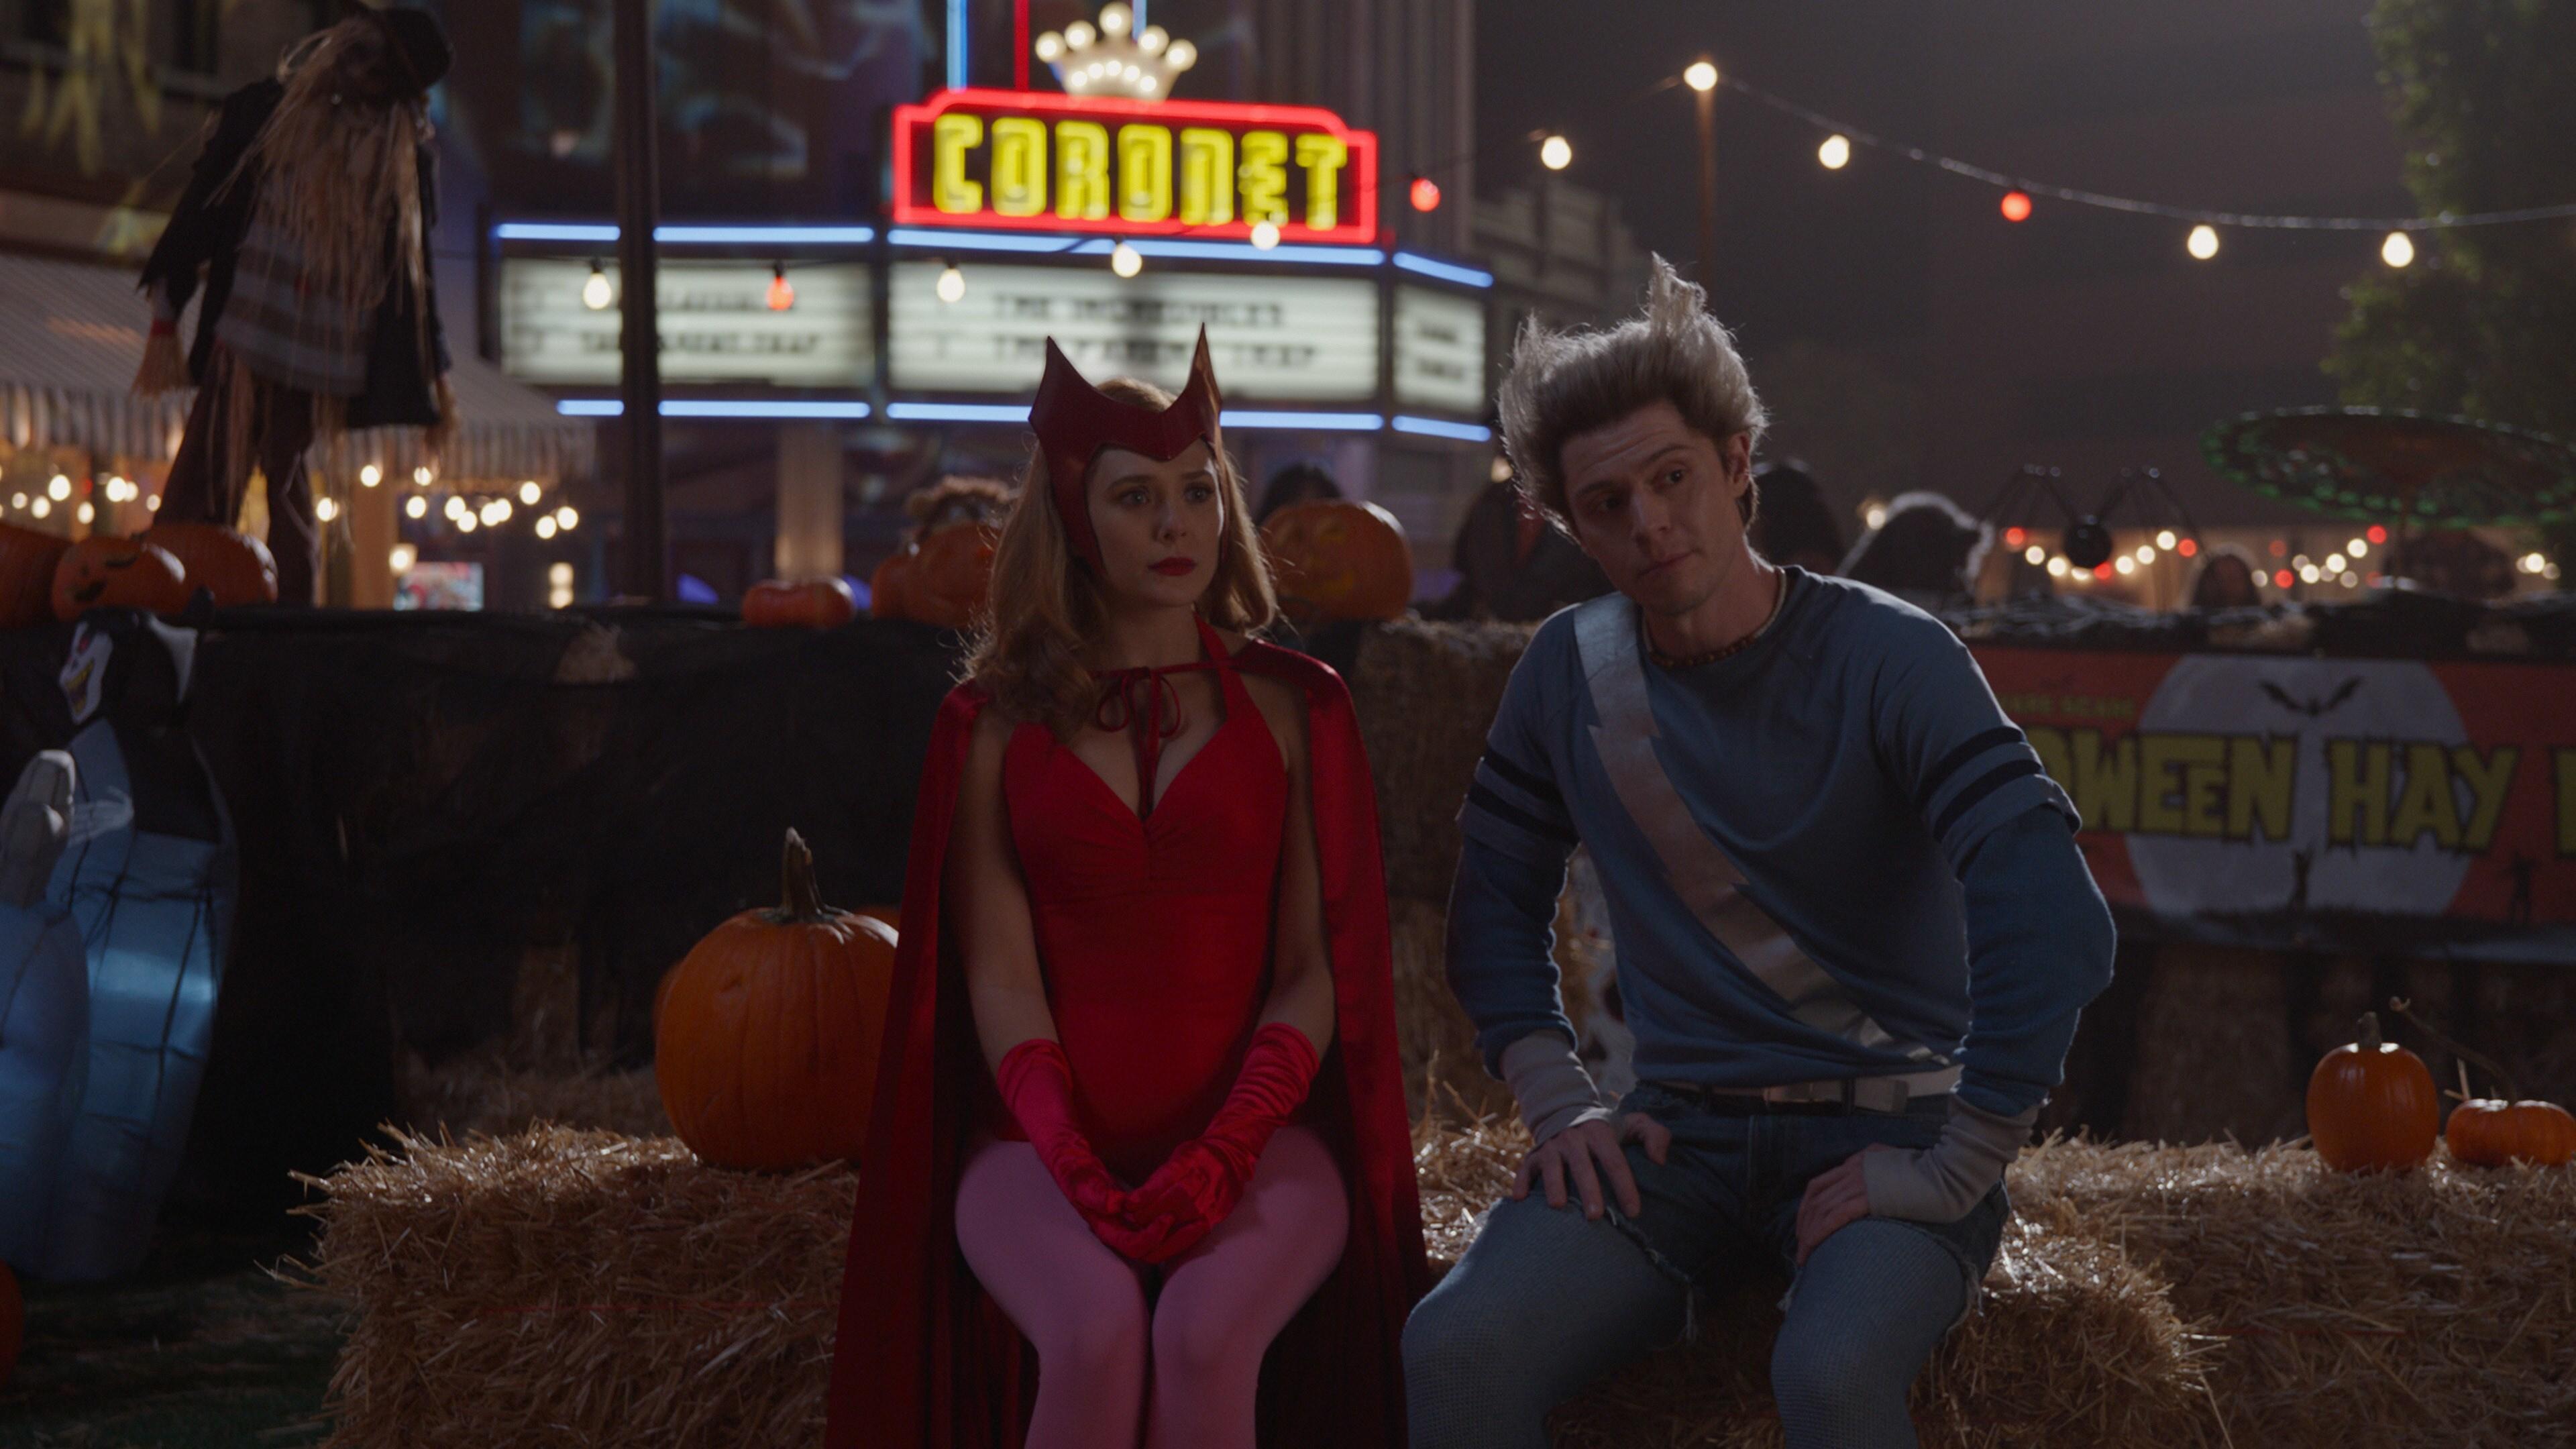 (L-R): Elizabeth Olsen as Wanda Maximoffand Evan Peters as Pietro in Marvel Studios' WANDAVISION exclusively on Disney+. Photo courtesy of Marvel Studios. ©Marvel Studios 2021. All Rights Reserved.